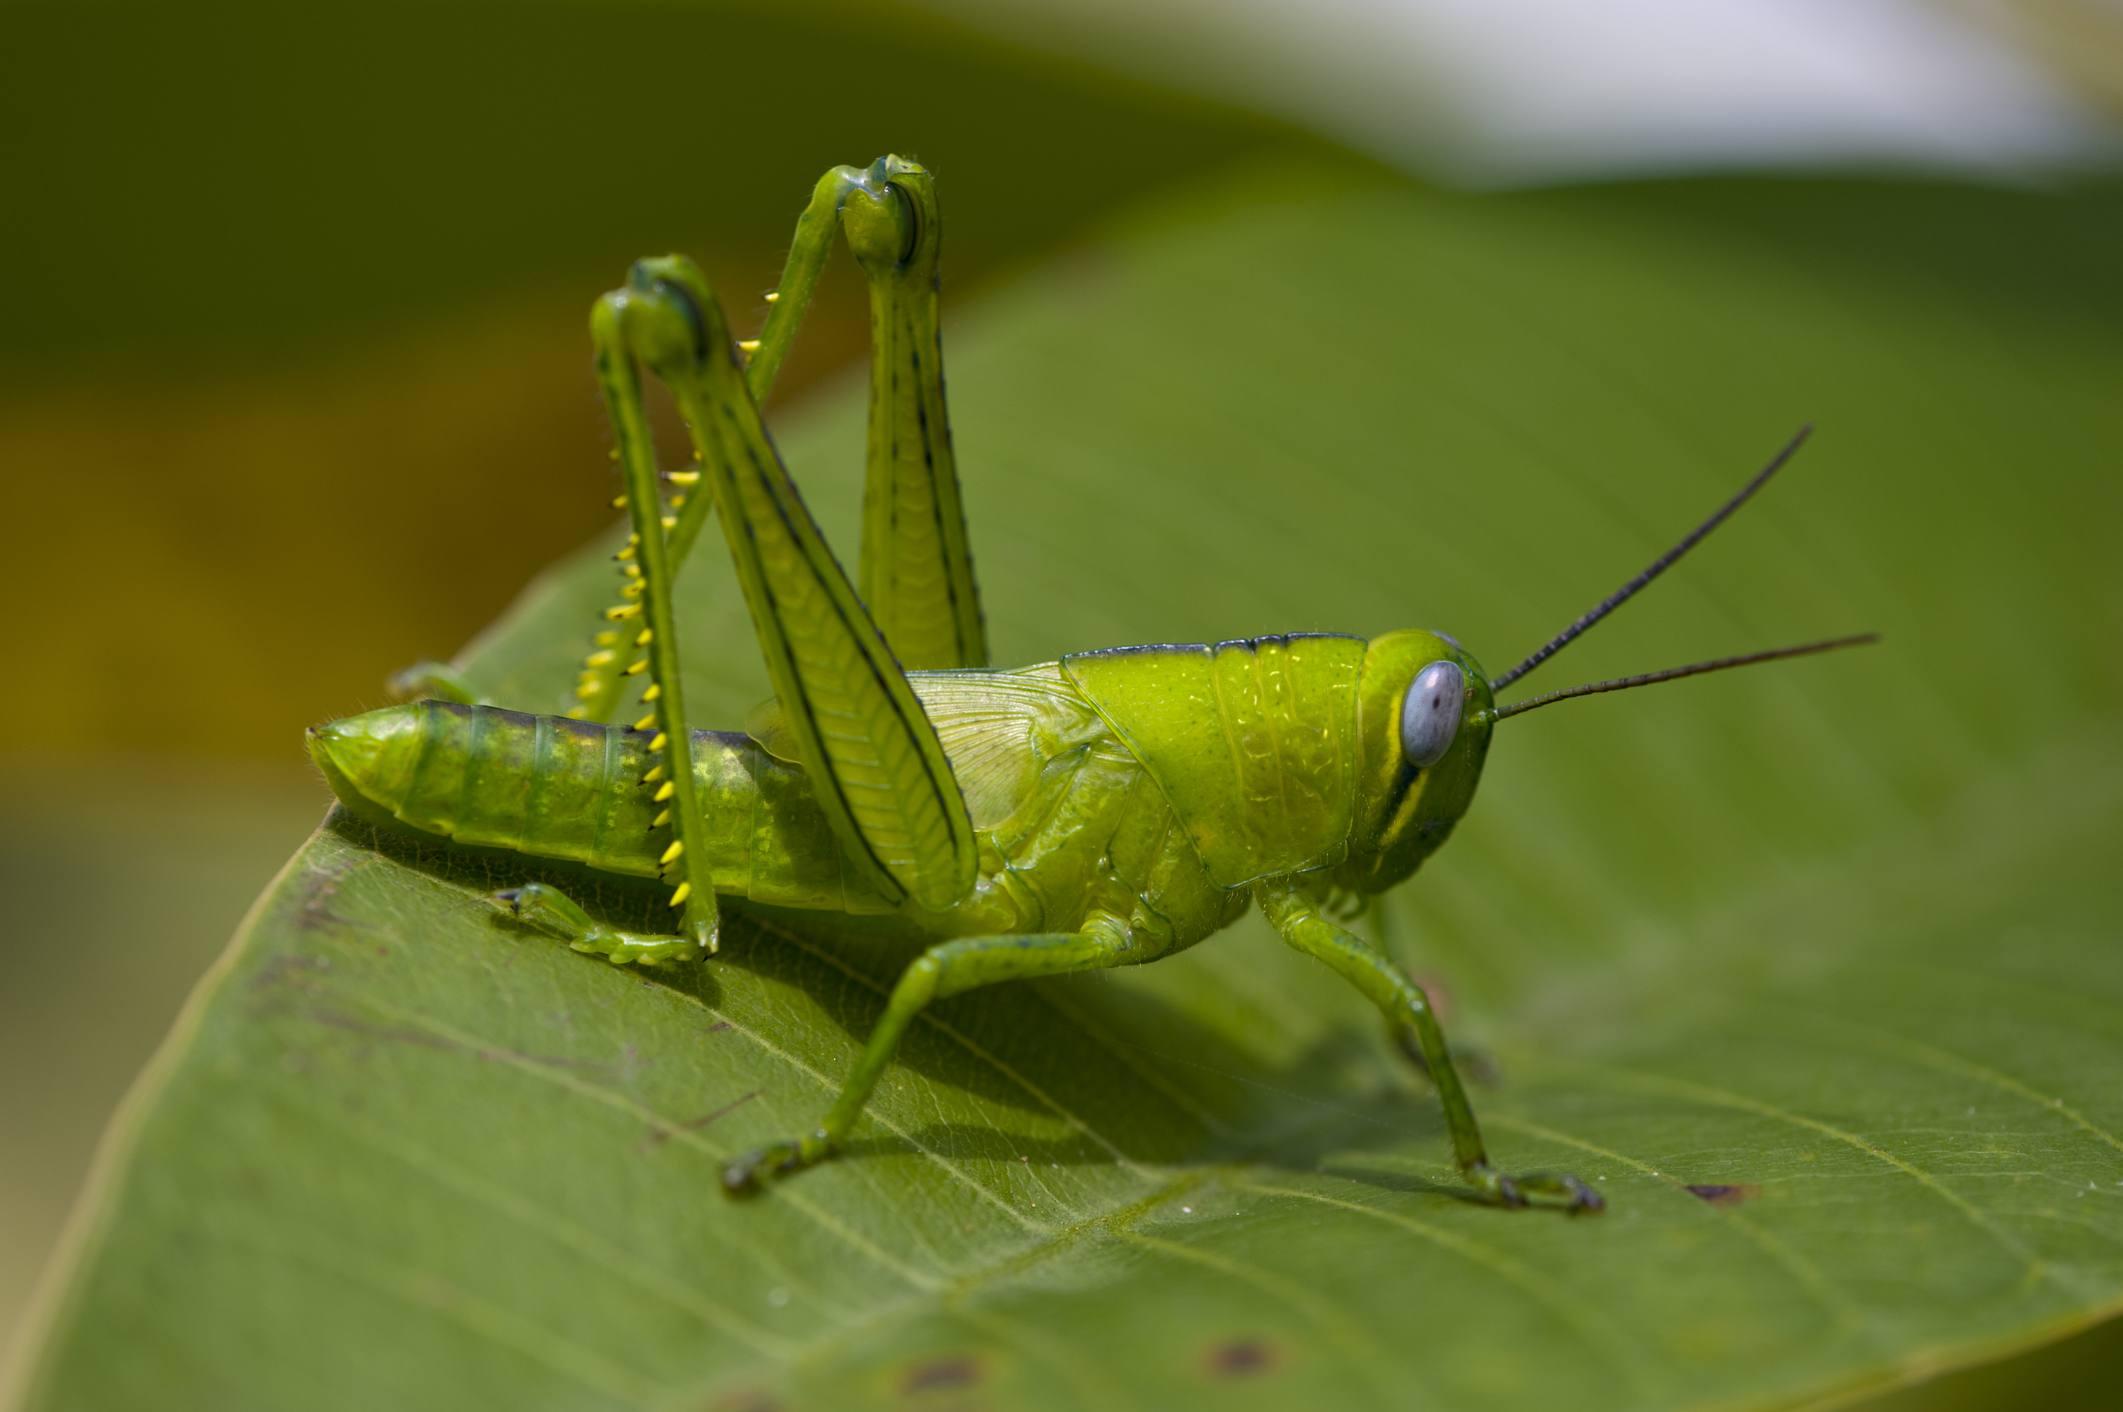 Grasshopper on leaf.